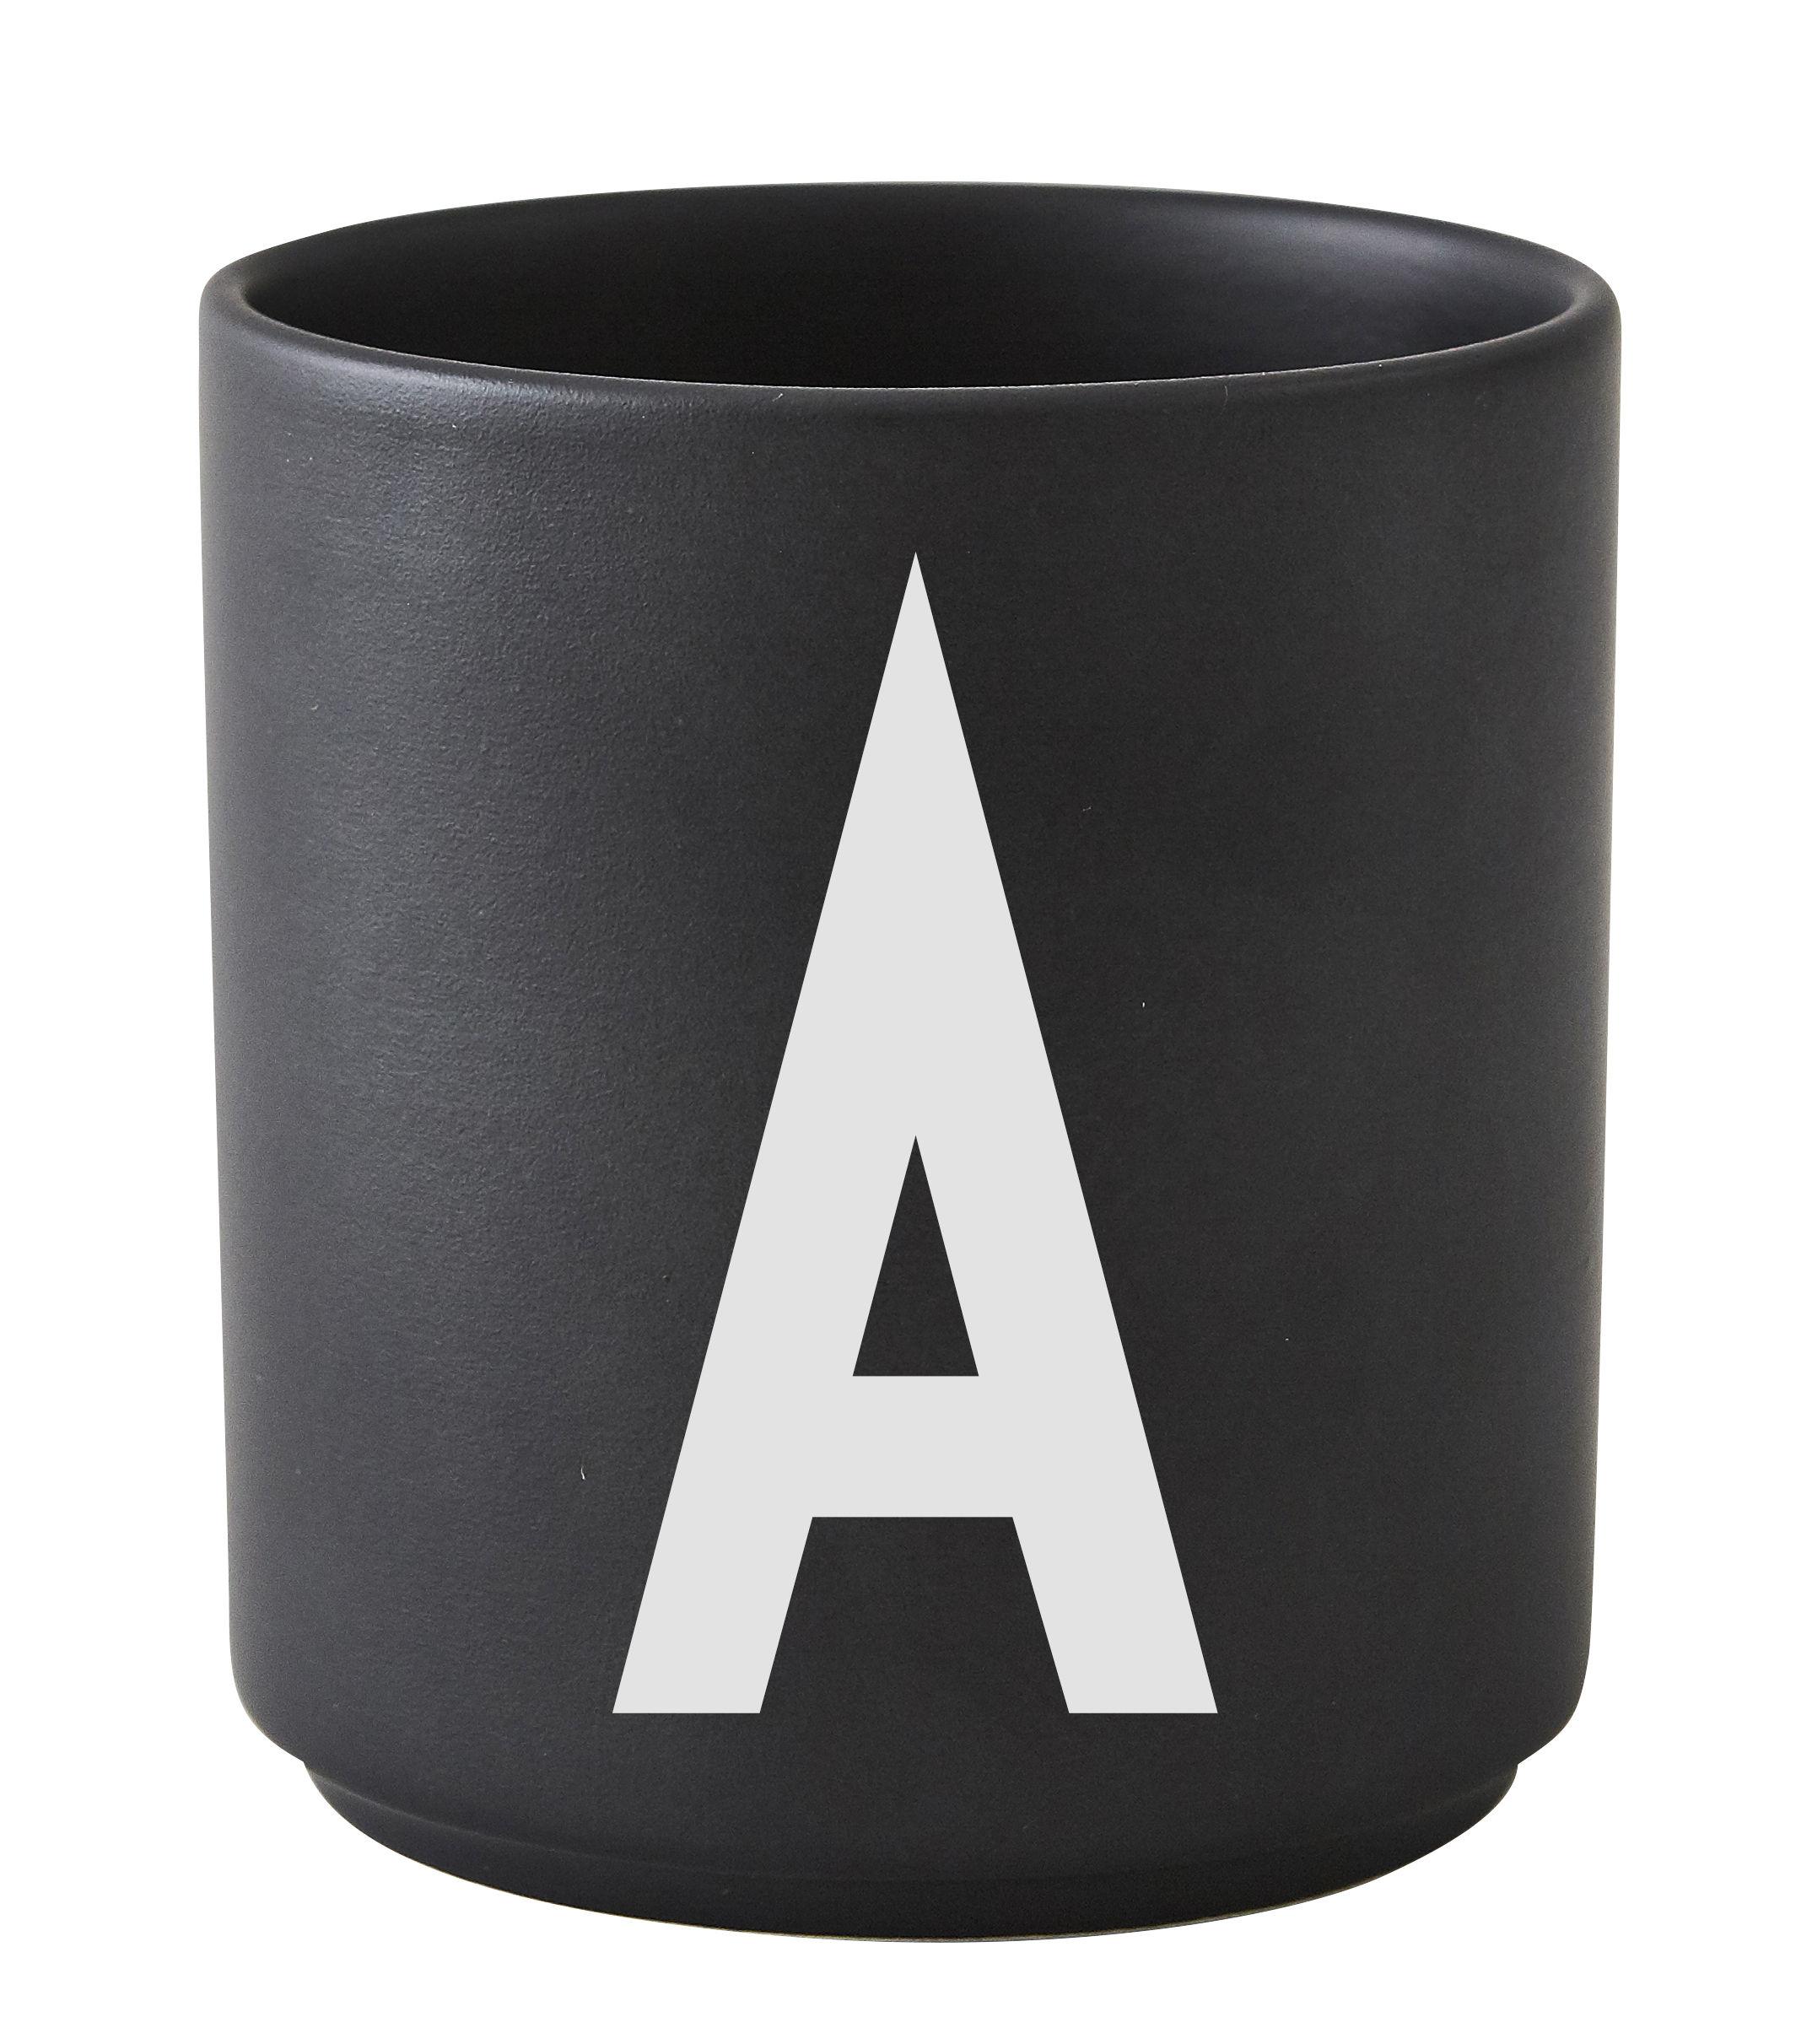 Tableware - Coffee Mugs & Tea Cups - Arne Jacobsen Mug - / Porcelain - Letter A by Design Letters - Black / Letter A - China